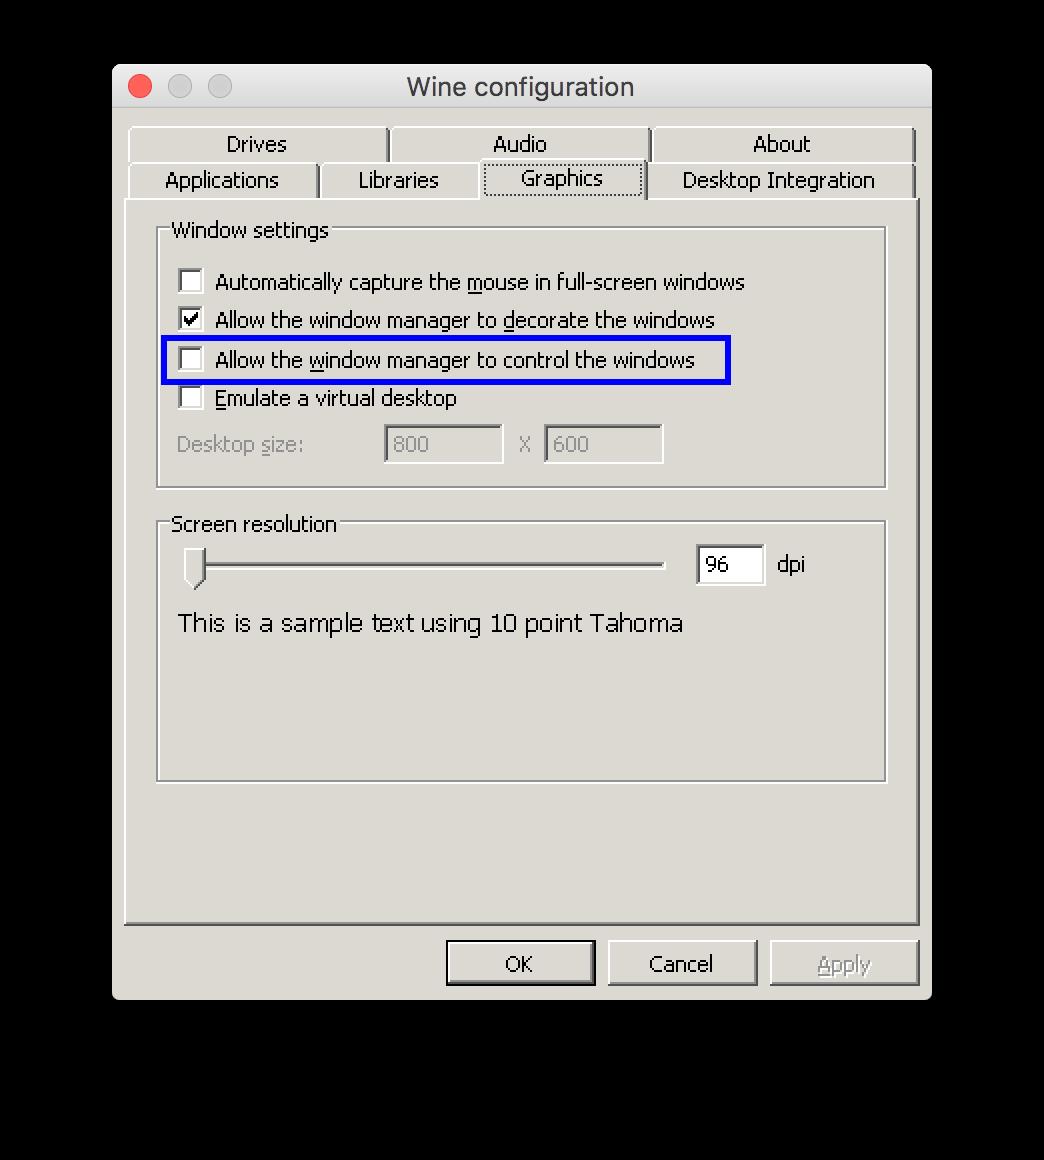 winecfg_windows_management